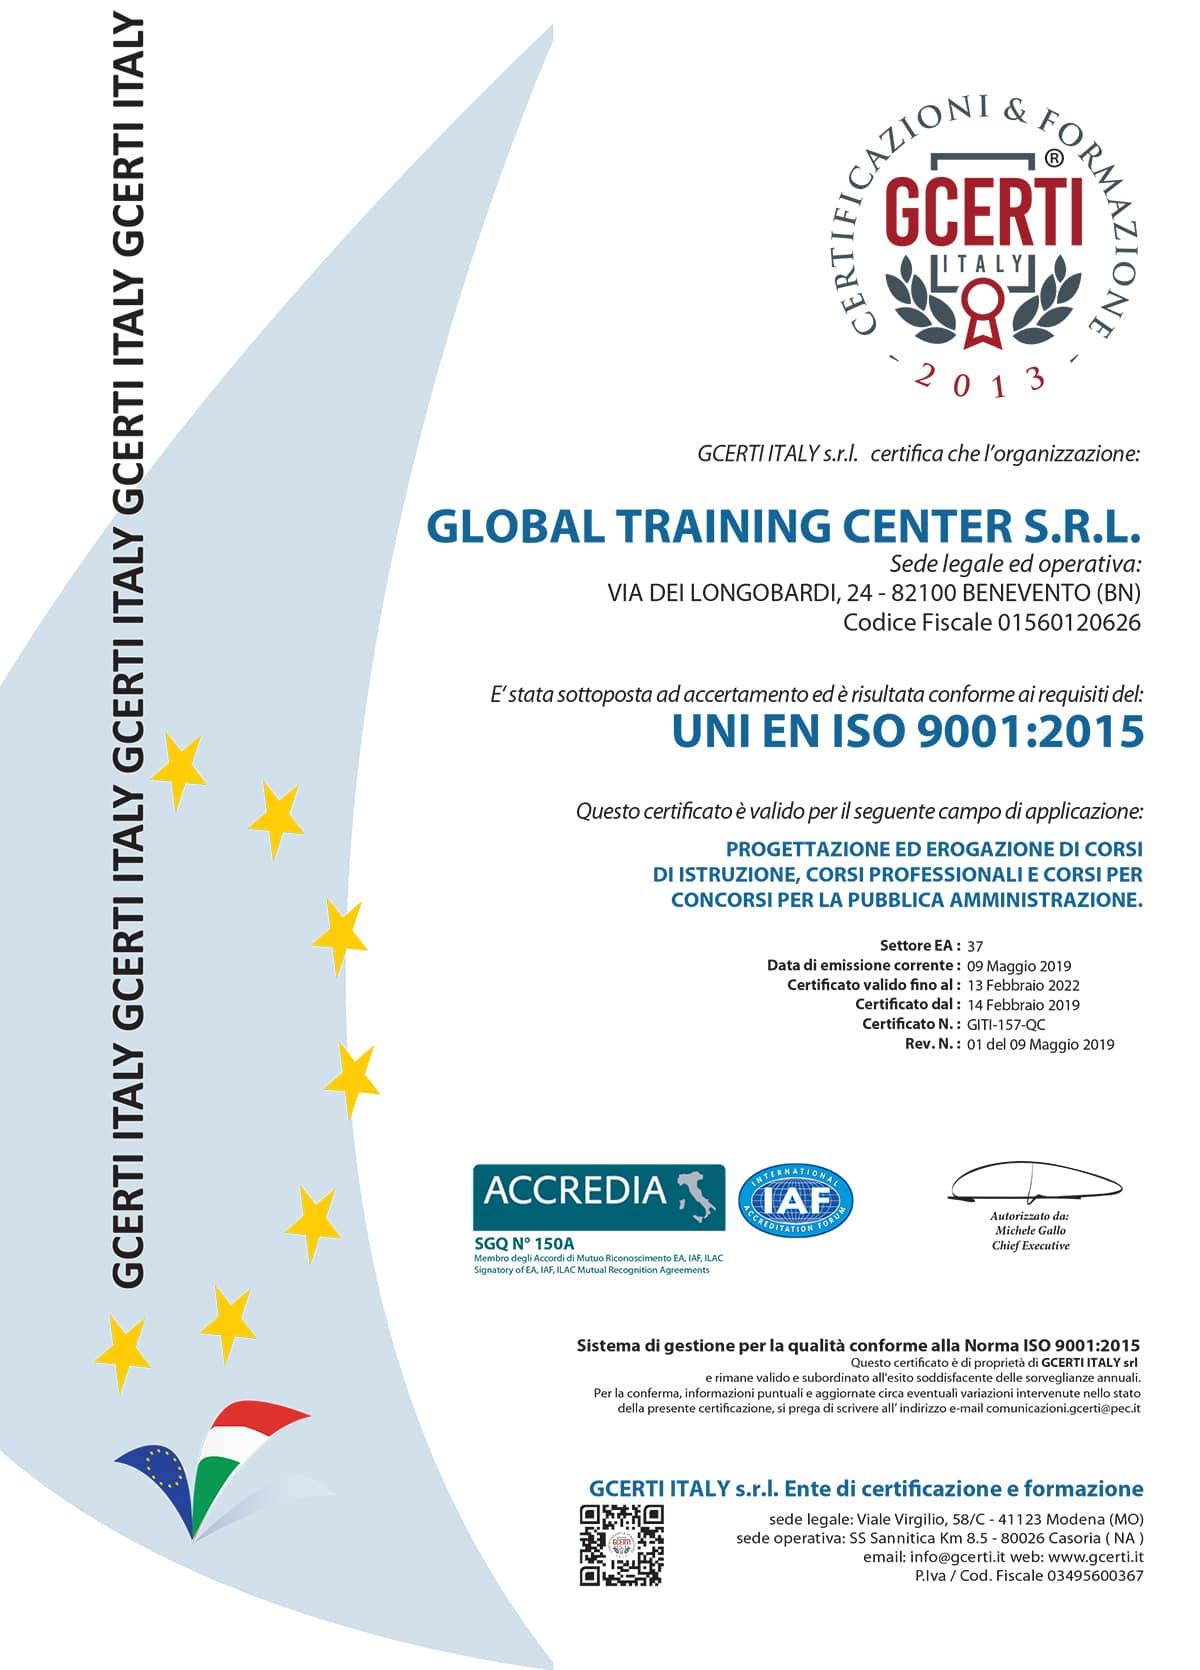 GLOBAL TRAINING CENTER Certificazione